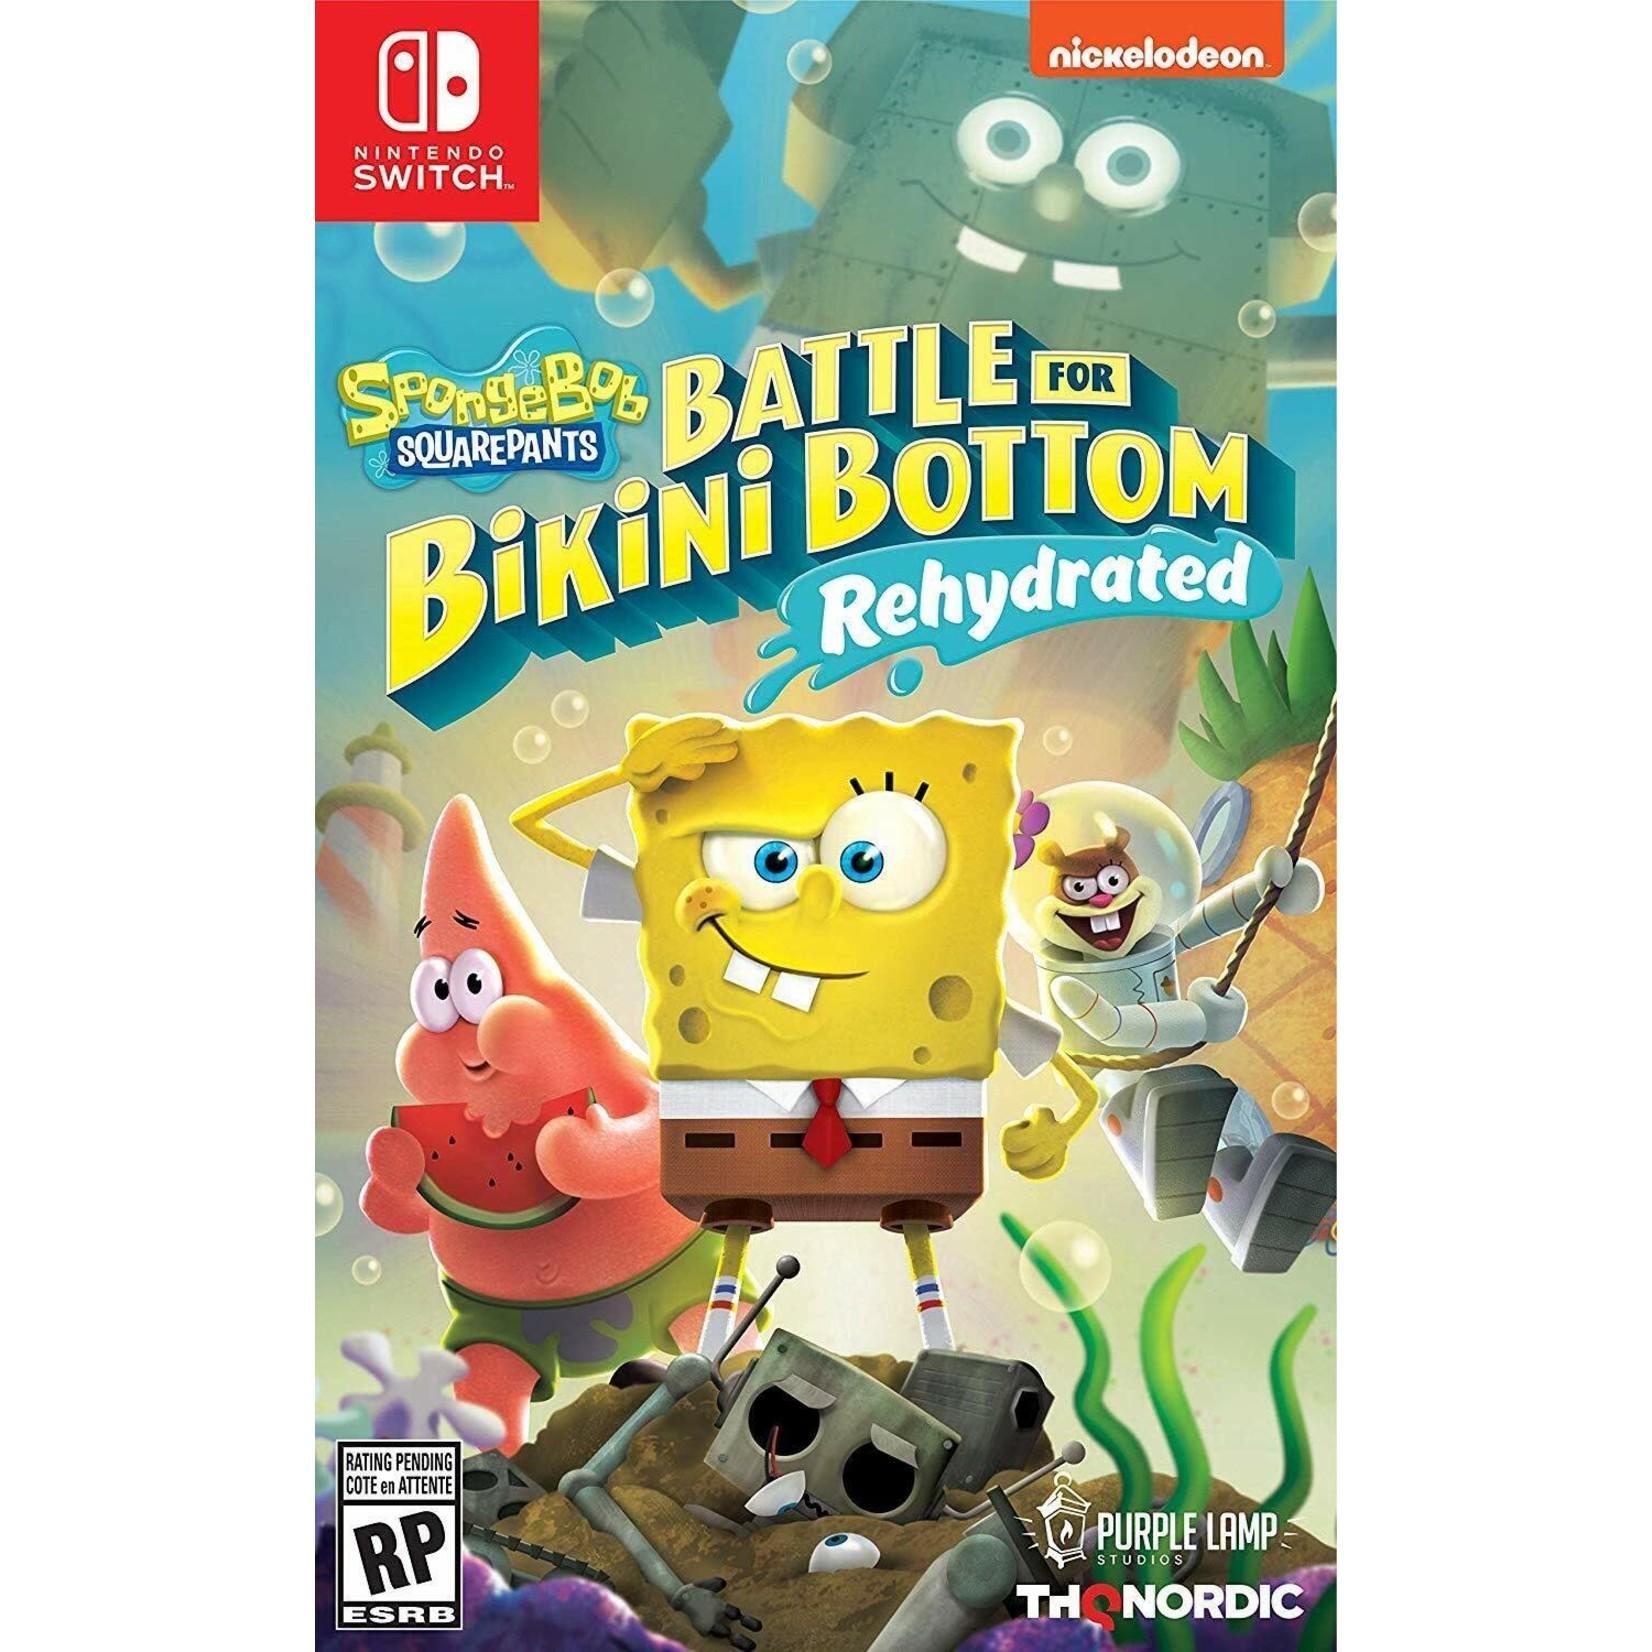 Switchu-SpongeBob SquarePants: Battle for Bikini Bottom - Rehydrated